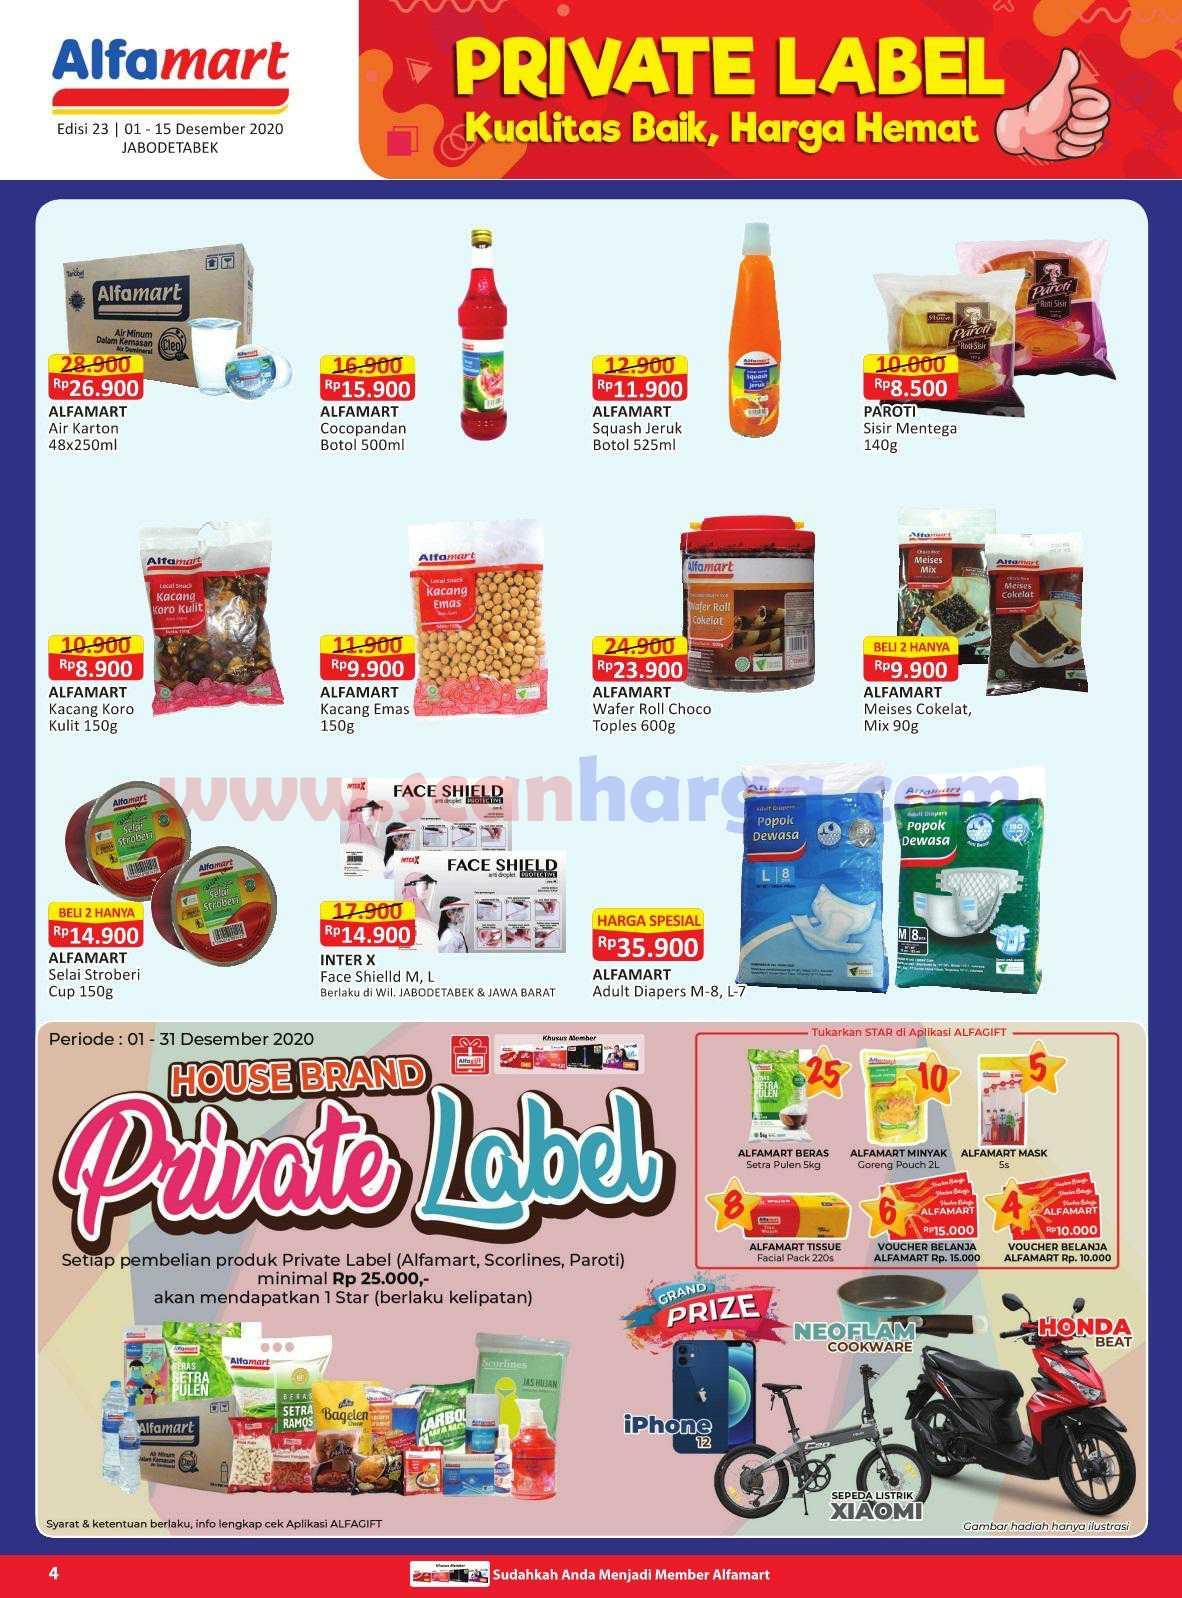 Katalog Promo Alfamart 1 - 15 Desember 2020 4